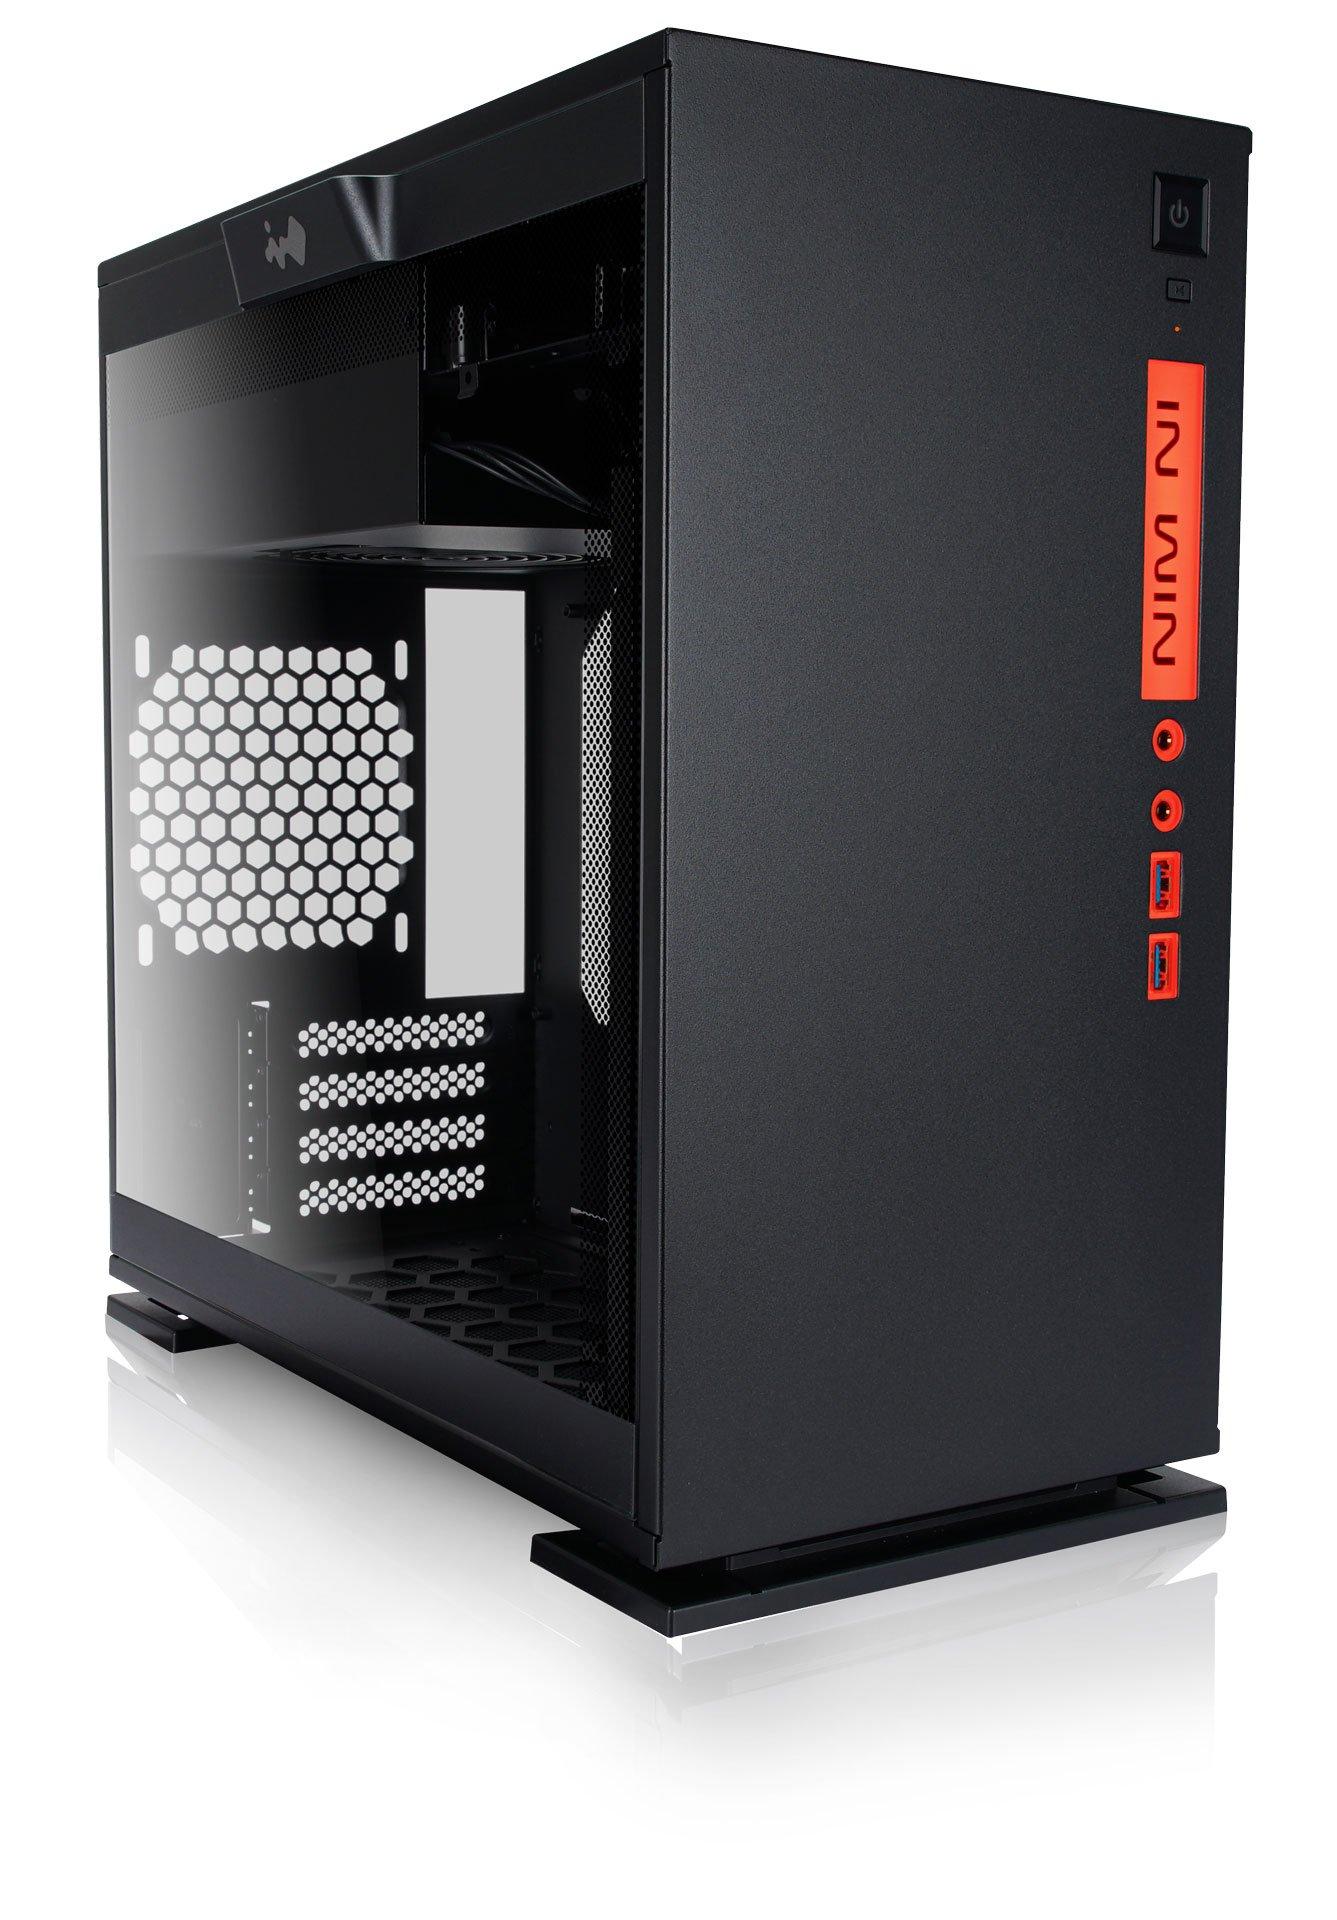 In Win 301 Black Tempered Glass Premium Micro-ATX Mini-ITX Tower Gaming Computer Case